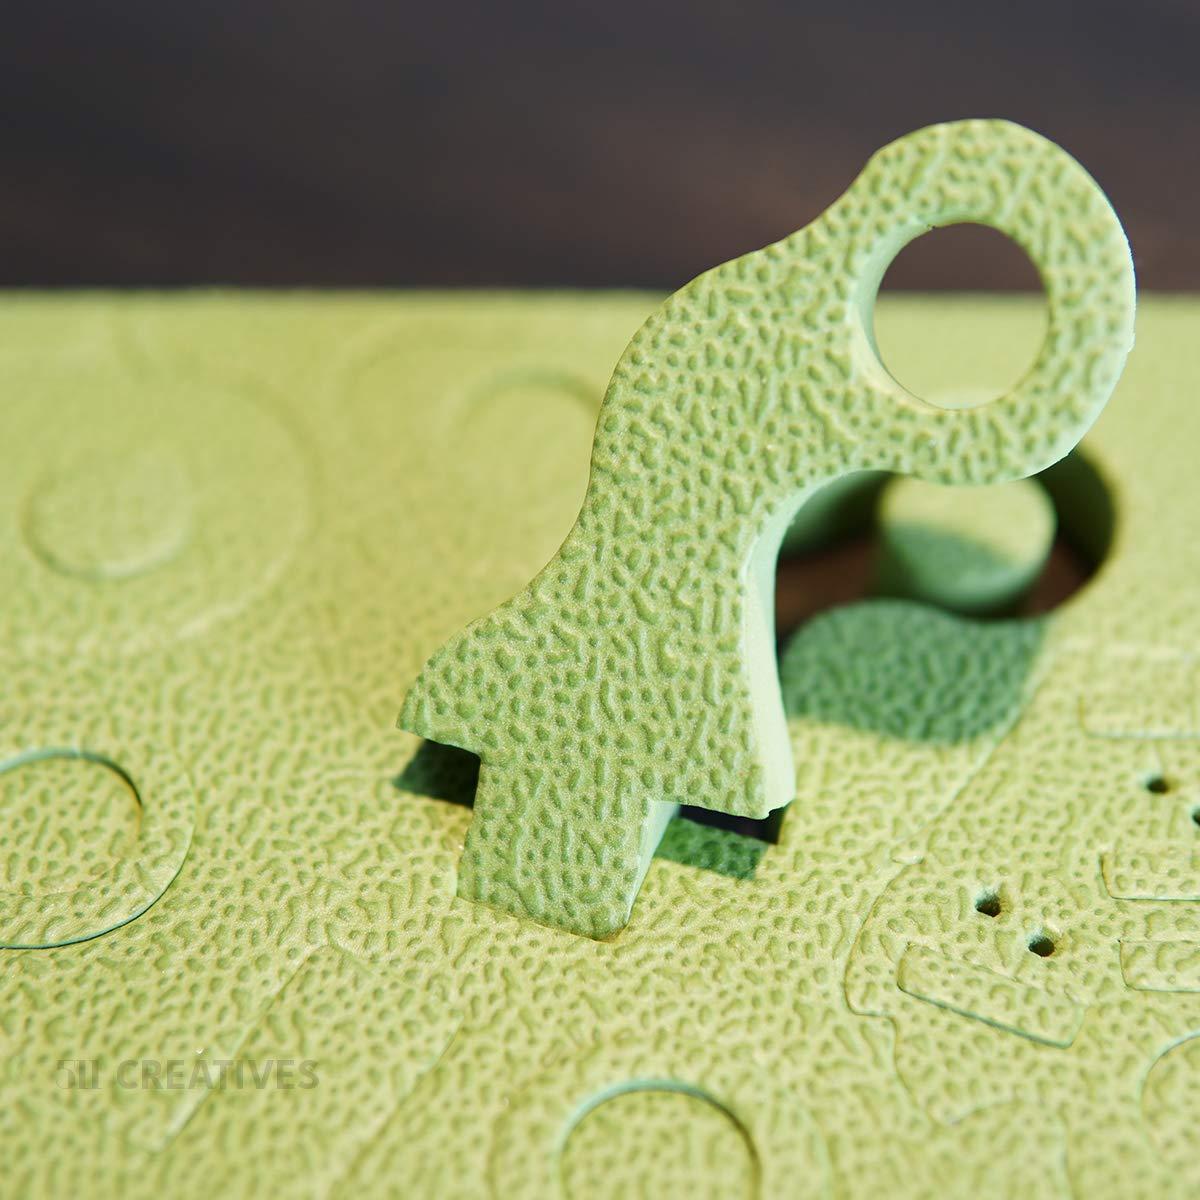 511 Creatives Original Educational Toys for Children 3D Interlocking Foam Puzzles Blocks Velociraptor and Stolen Egg STEM Toys